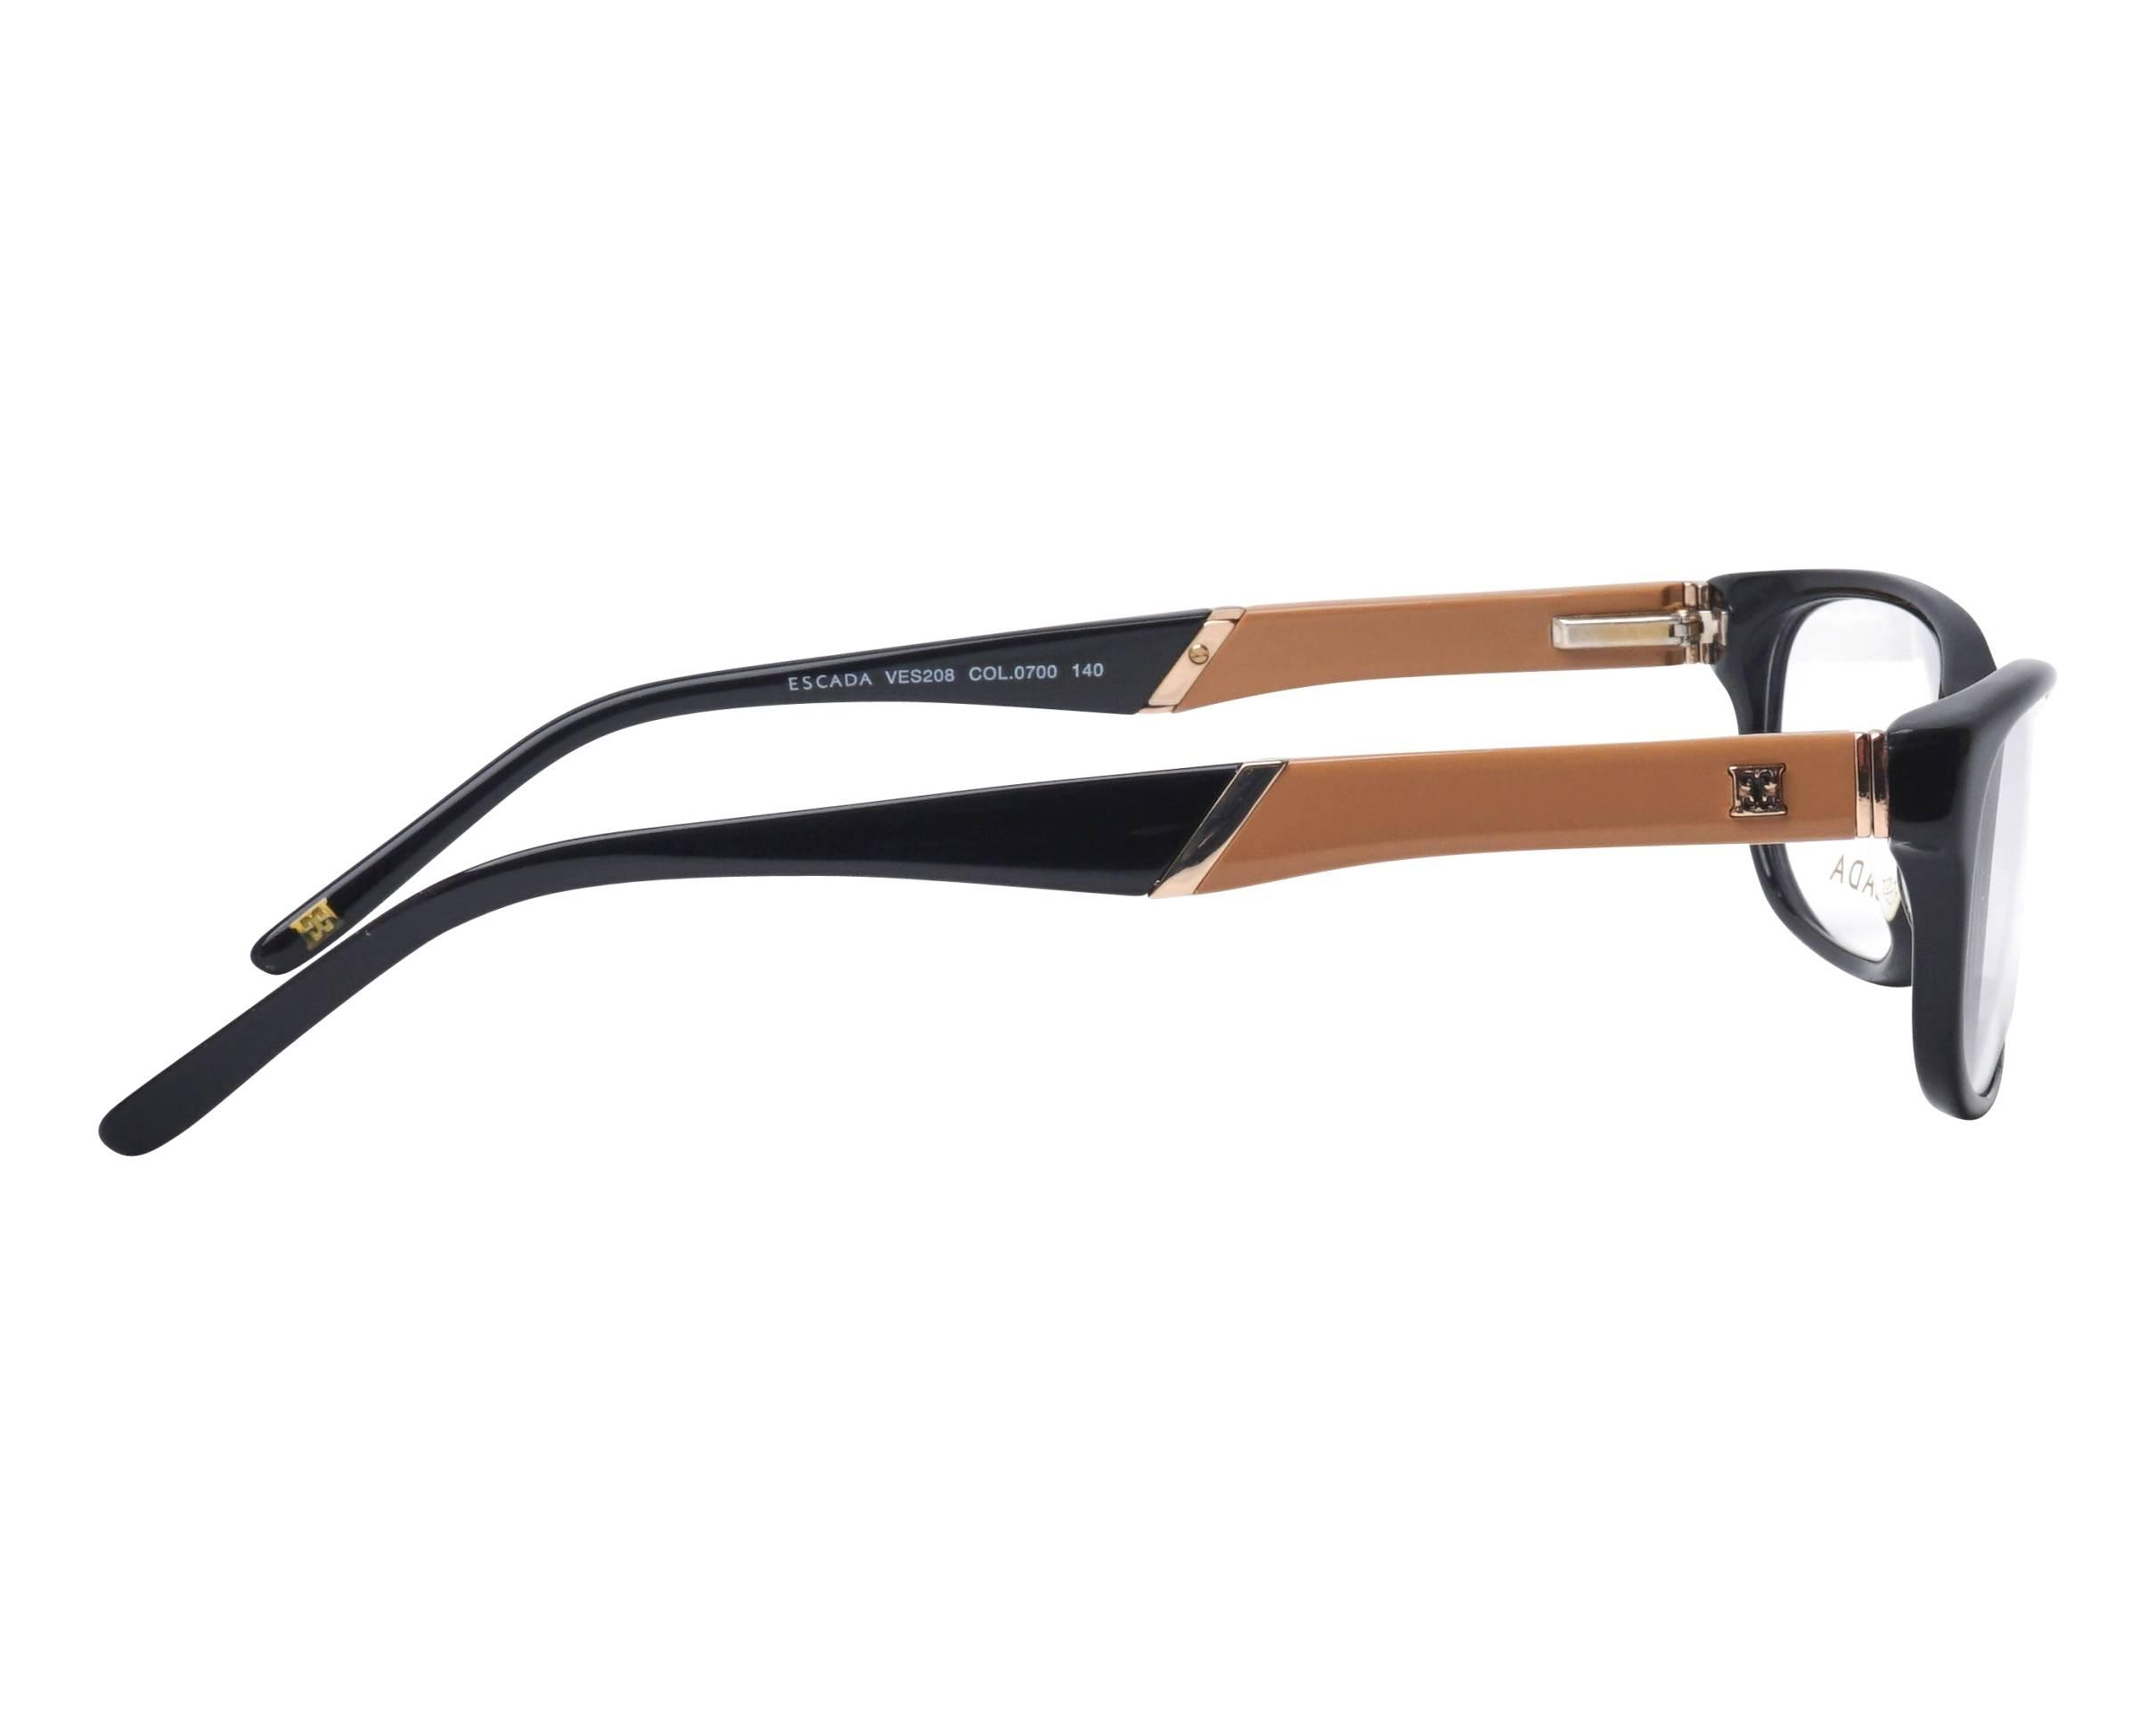 b36aabfae1 Gafas Graduadas Escada VES-208 0700 53-16 Negra Beige vista lateral